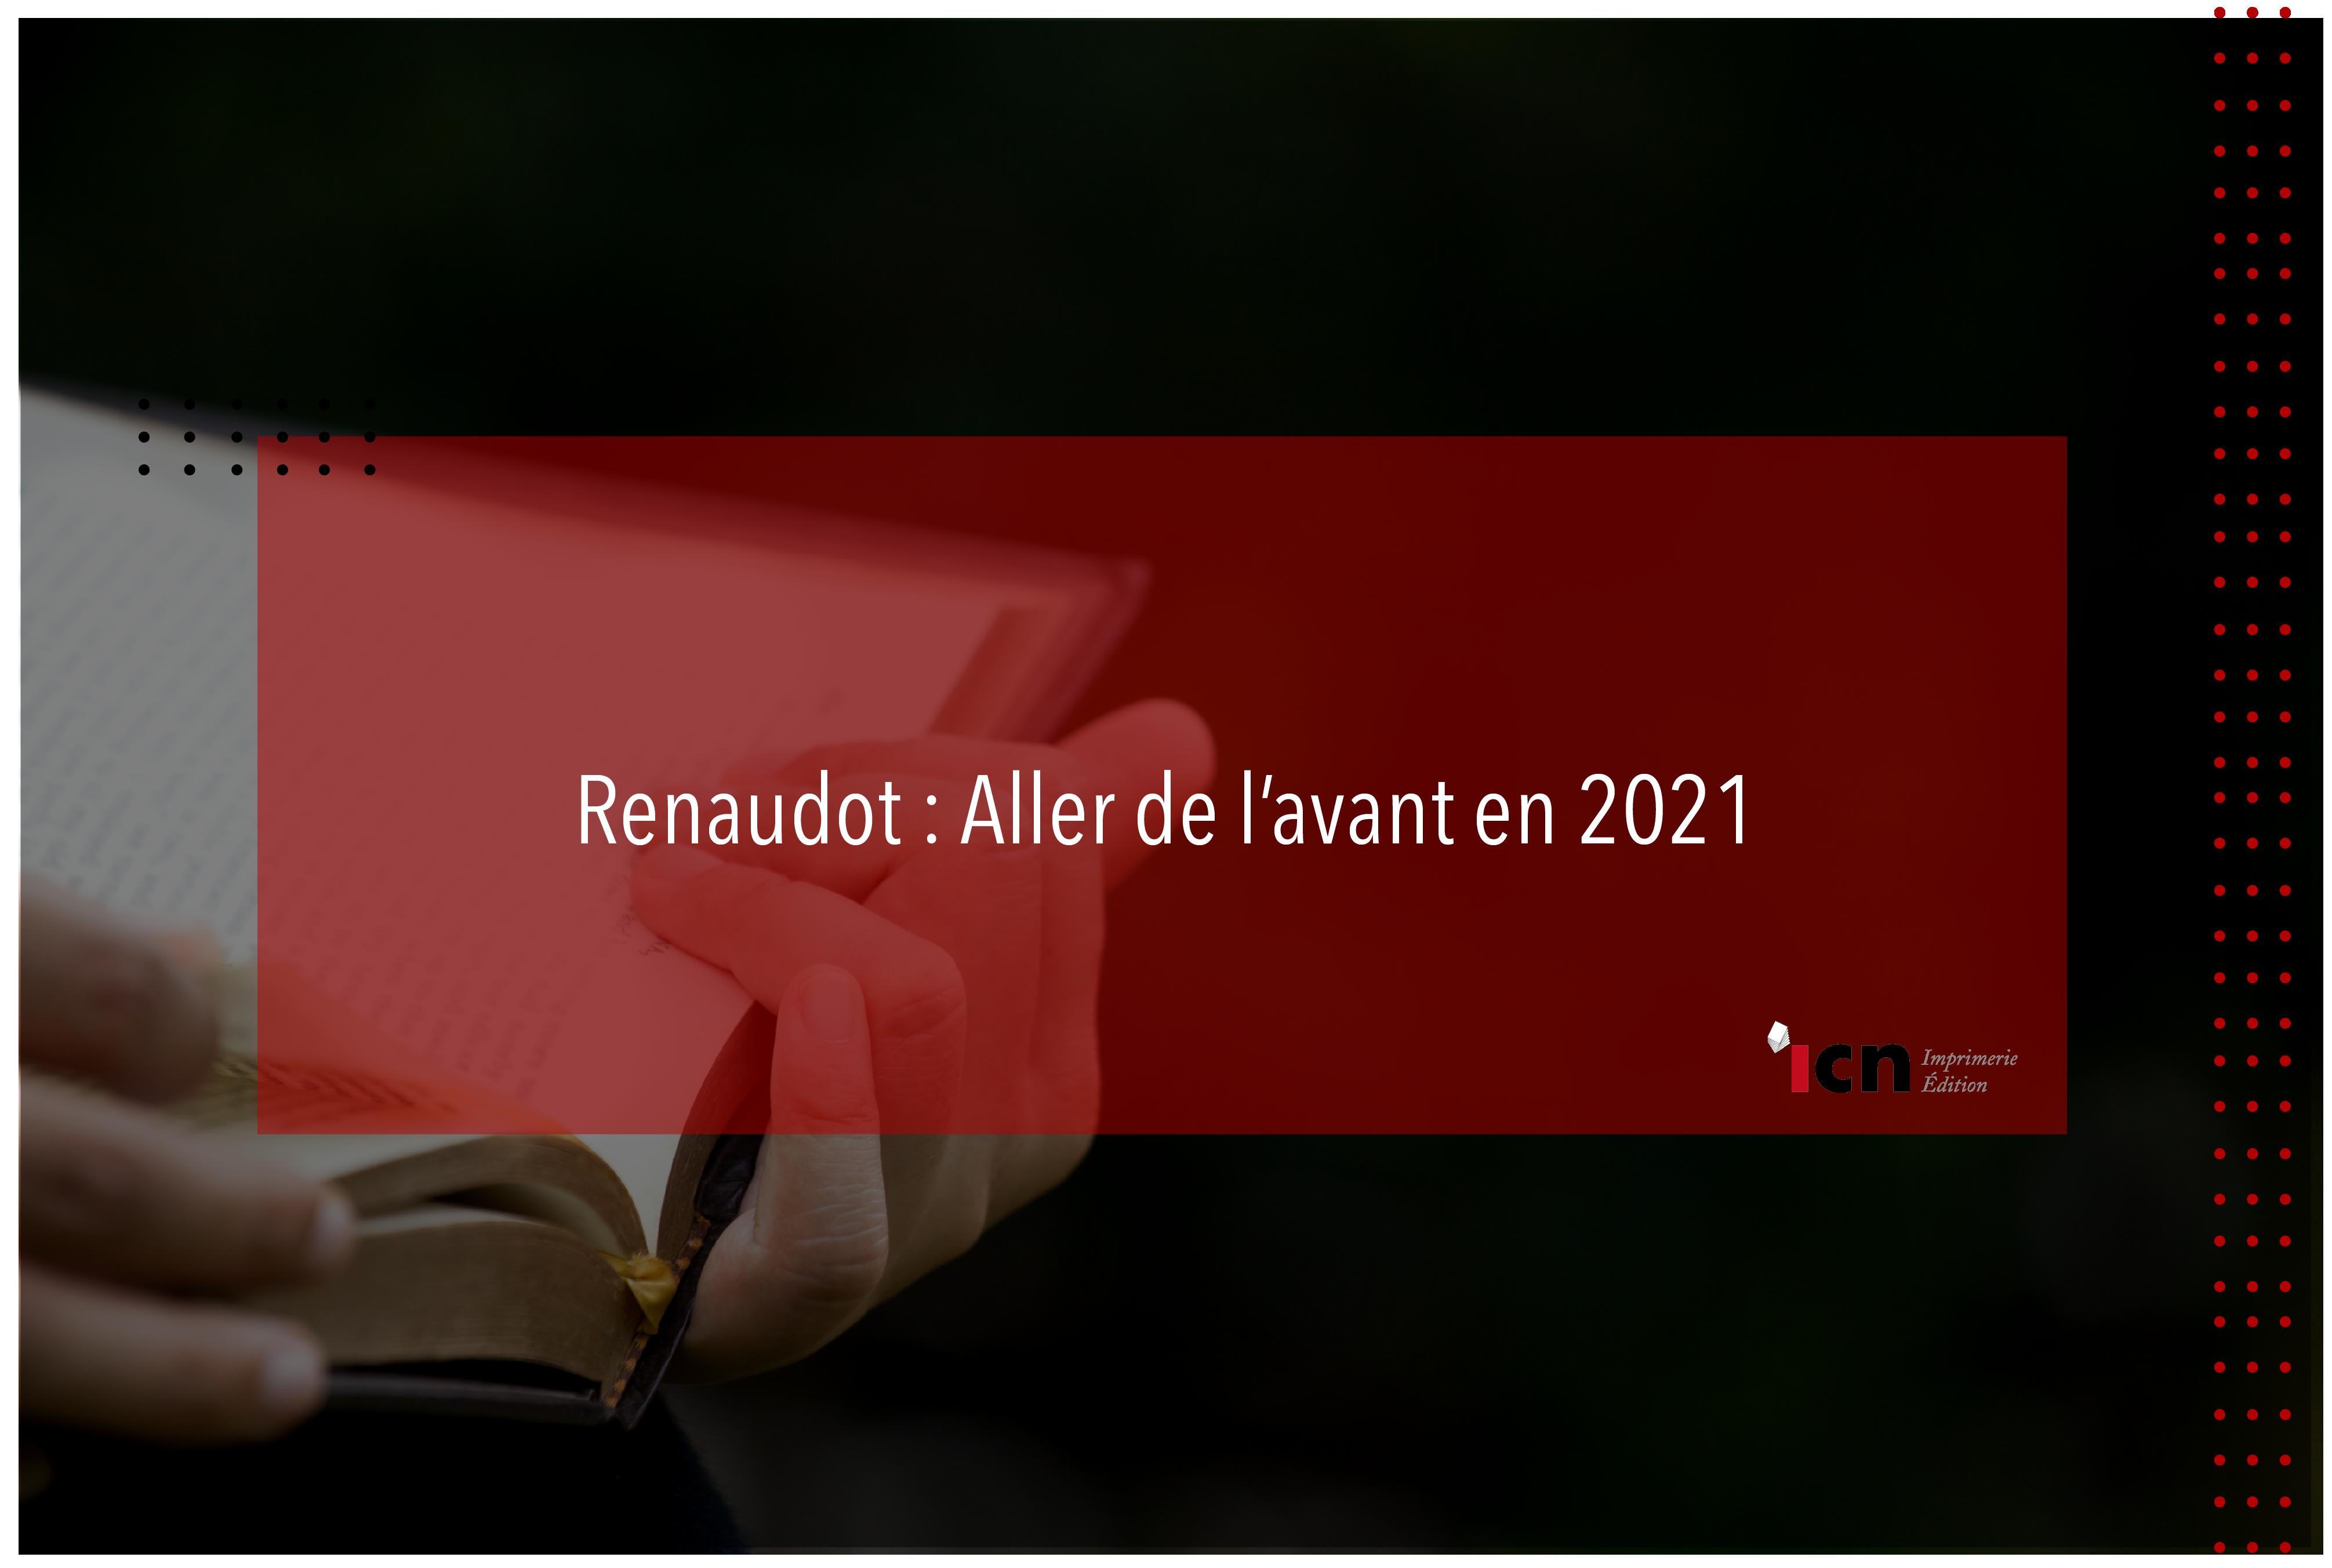 Renaudot : aller de l'avant en 2021